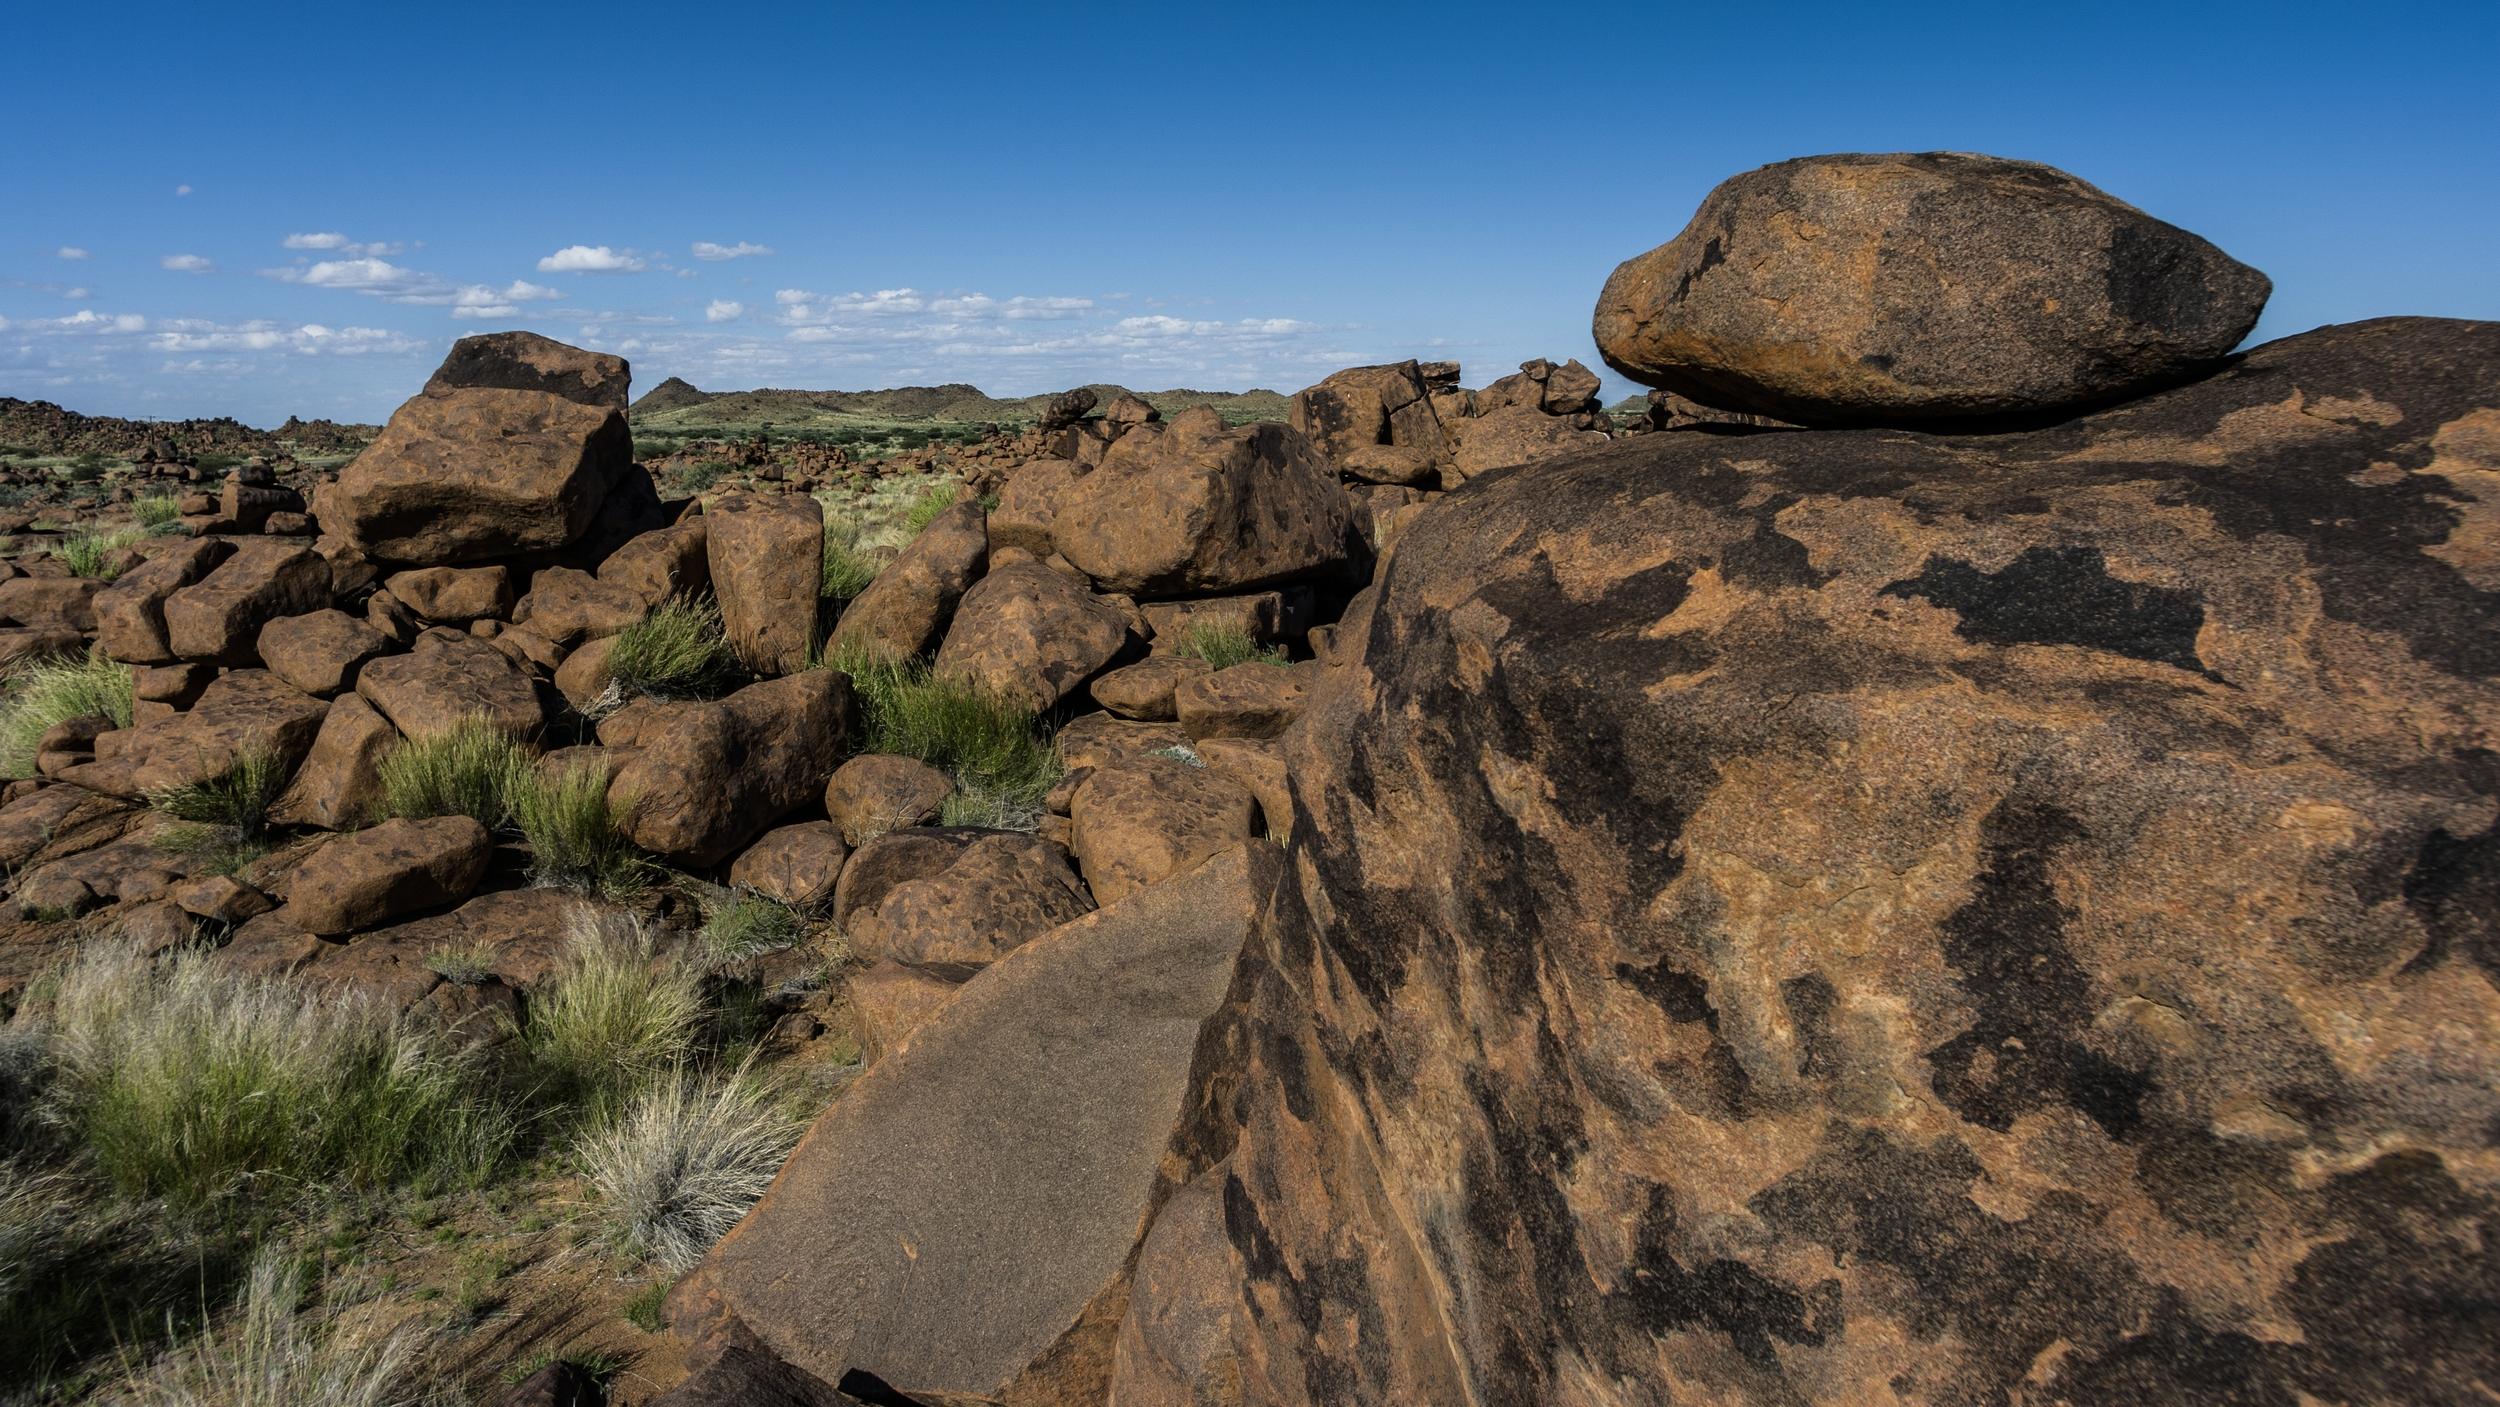 KEETMANSHOOP, NAMIBIA